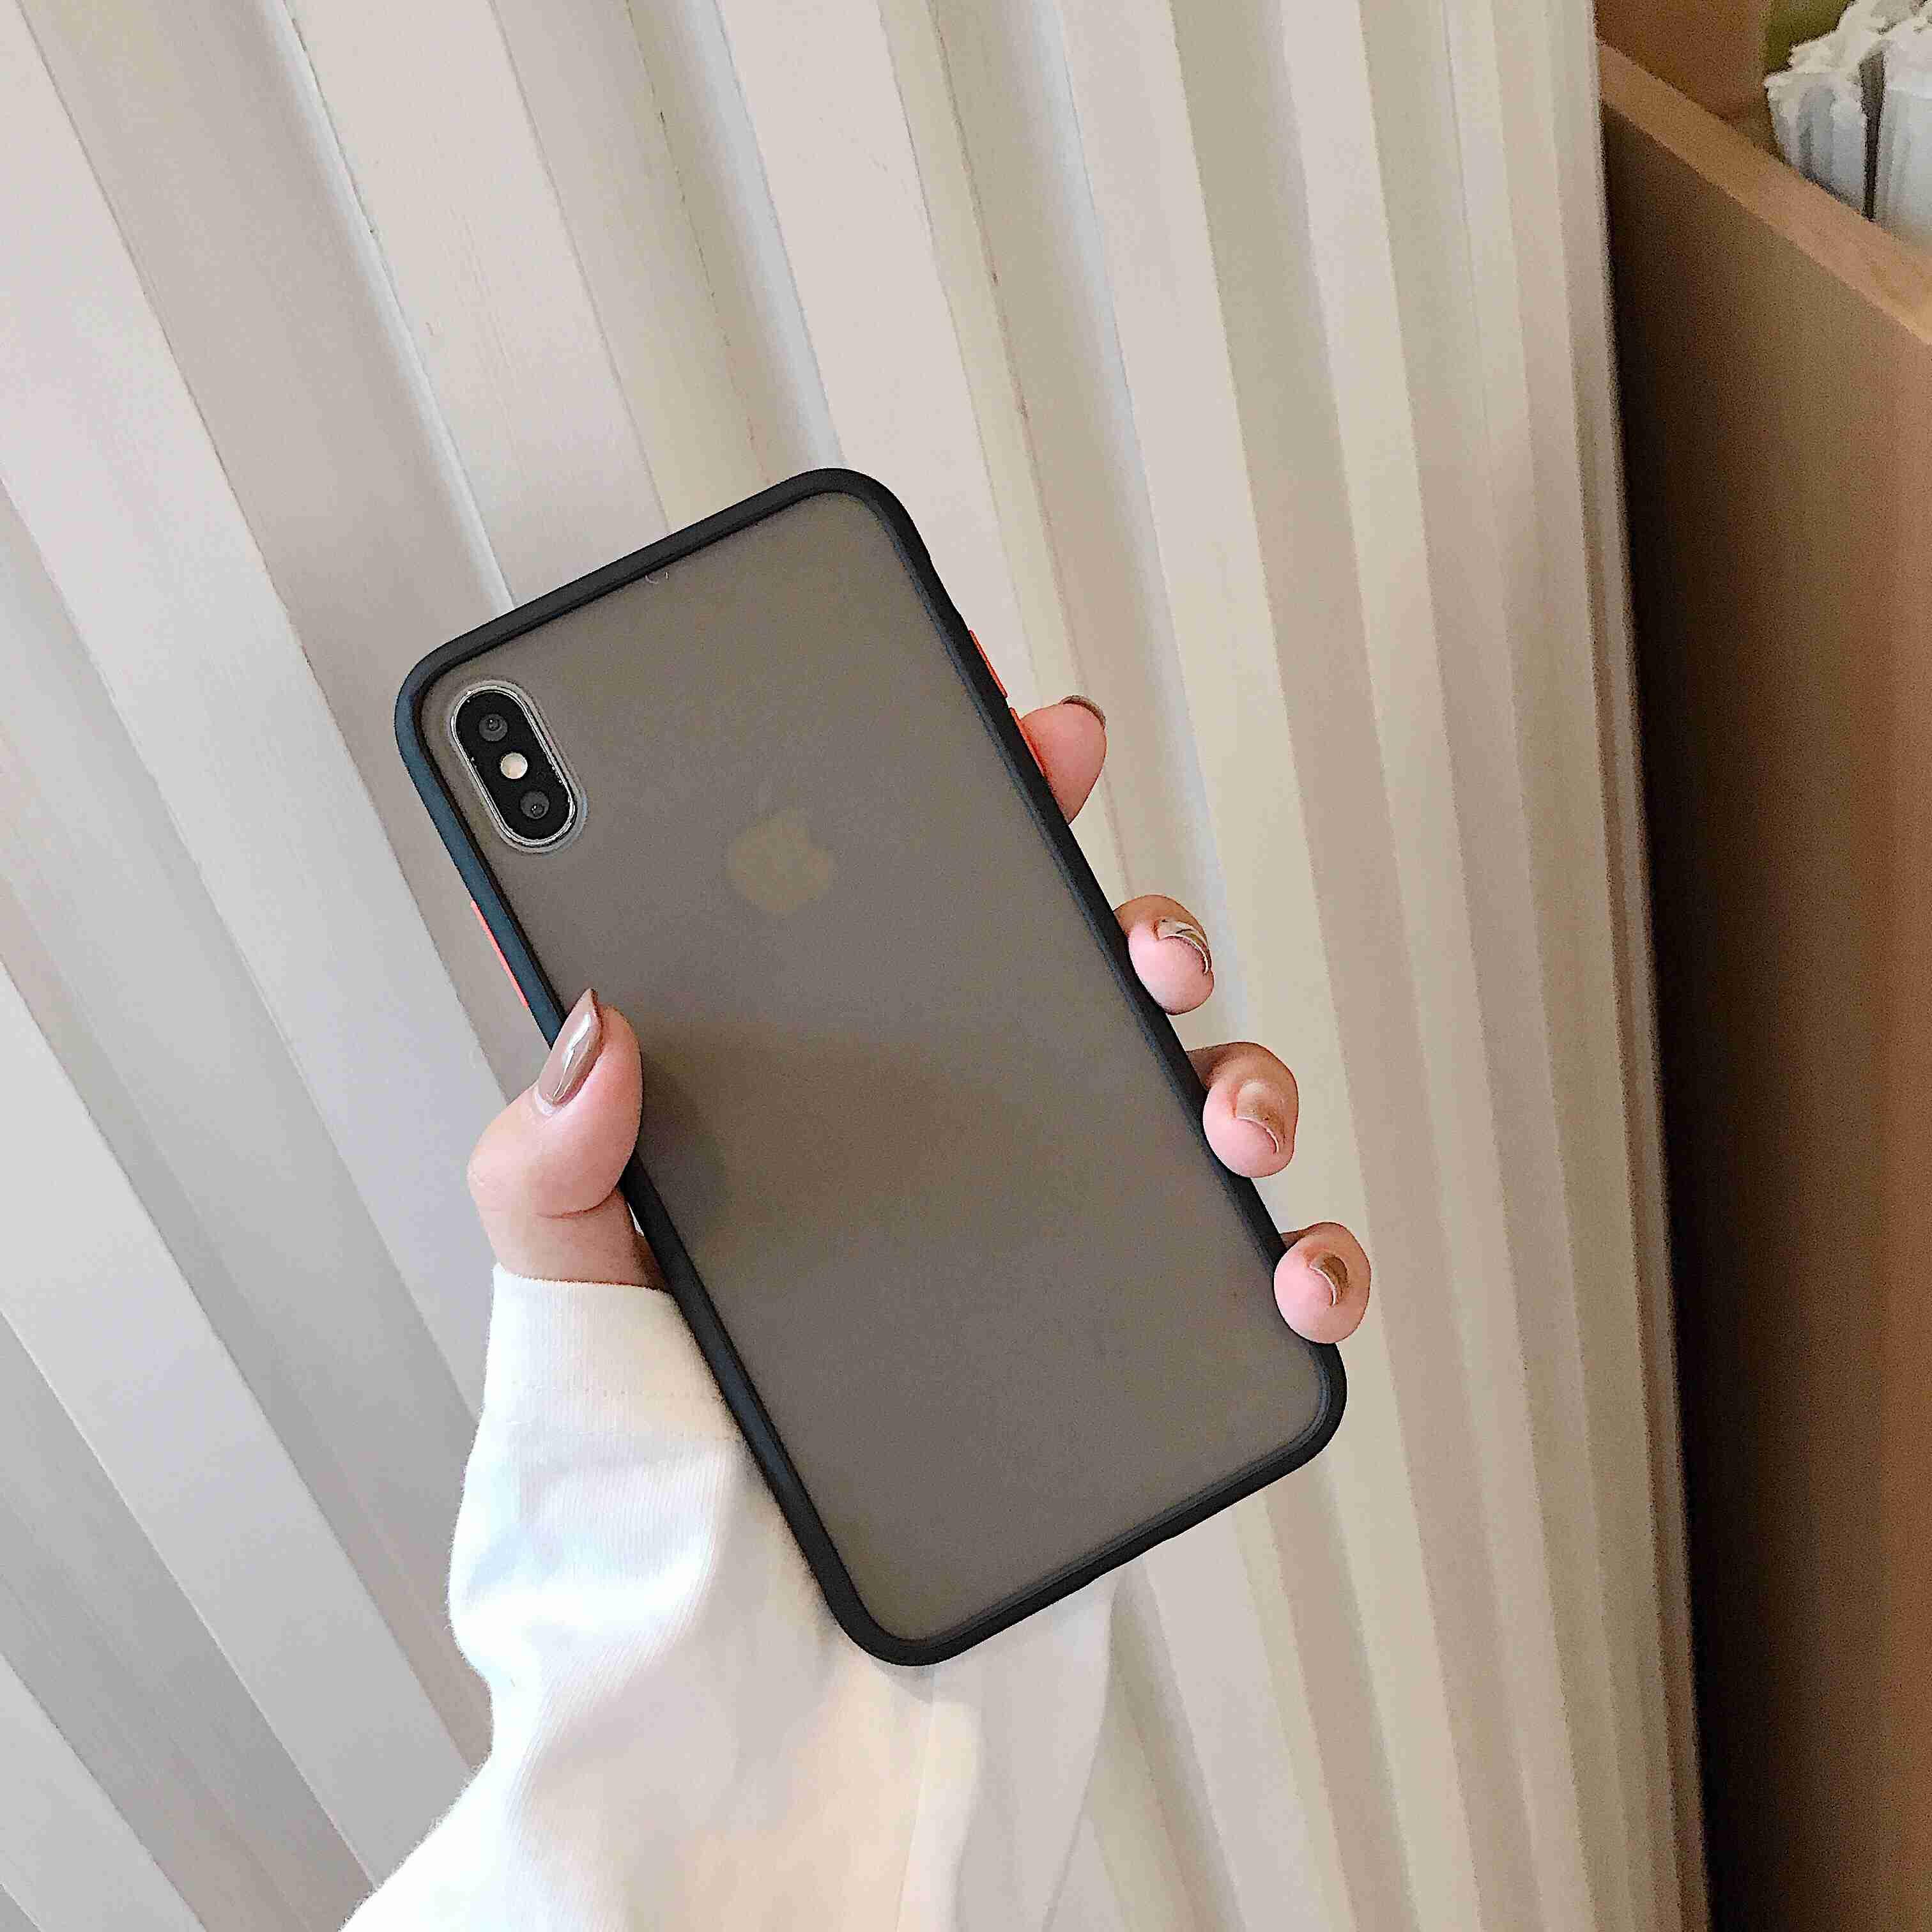 Бронированные Чехлы для Samsung Galaxy A9 Star Lite S8 A9S J4 J6 A6 Plus J2 Core J260 J8 2018 матовая Противоударная мягкая рамка чехол Fundas